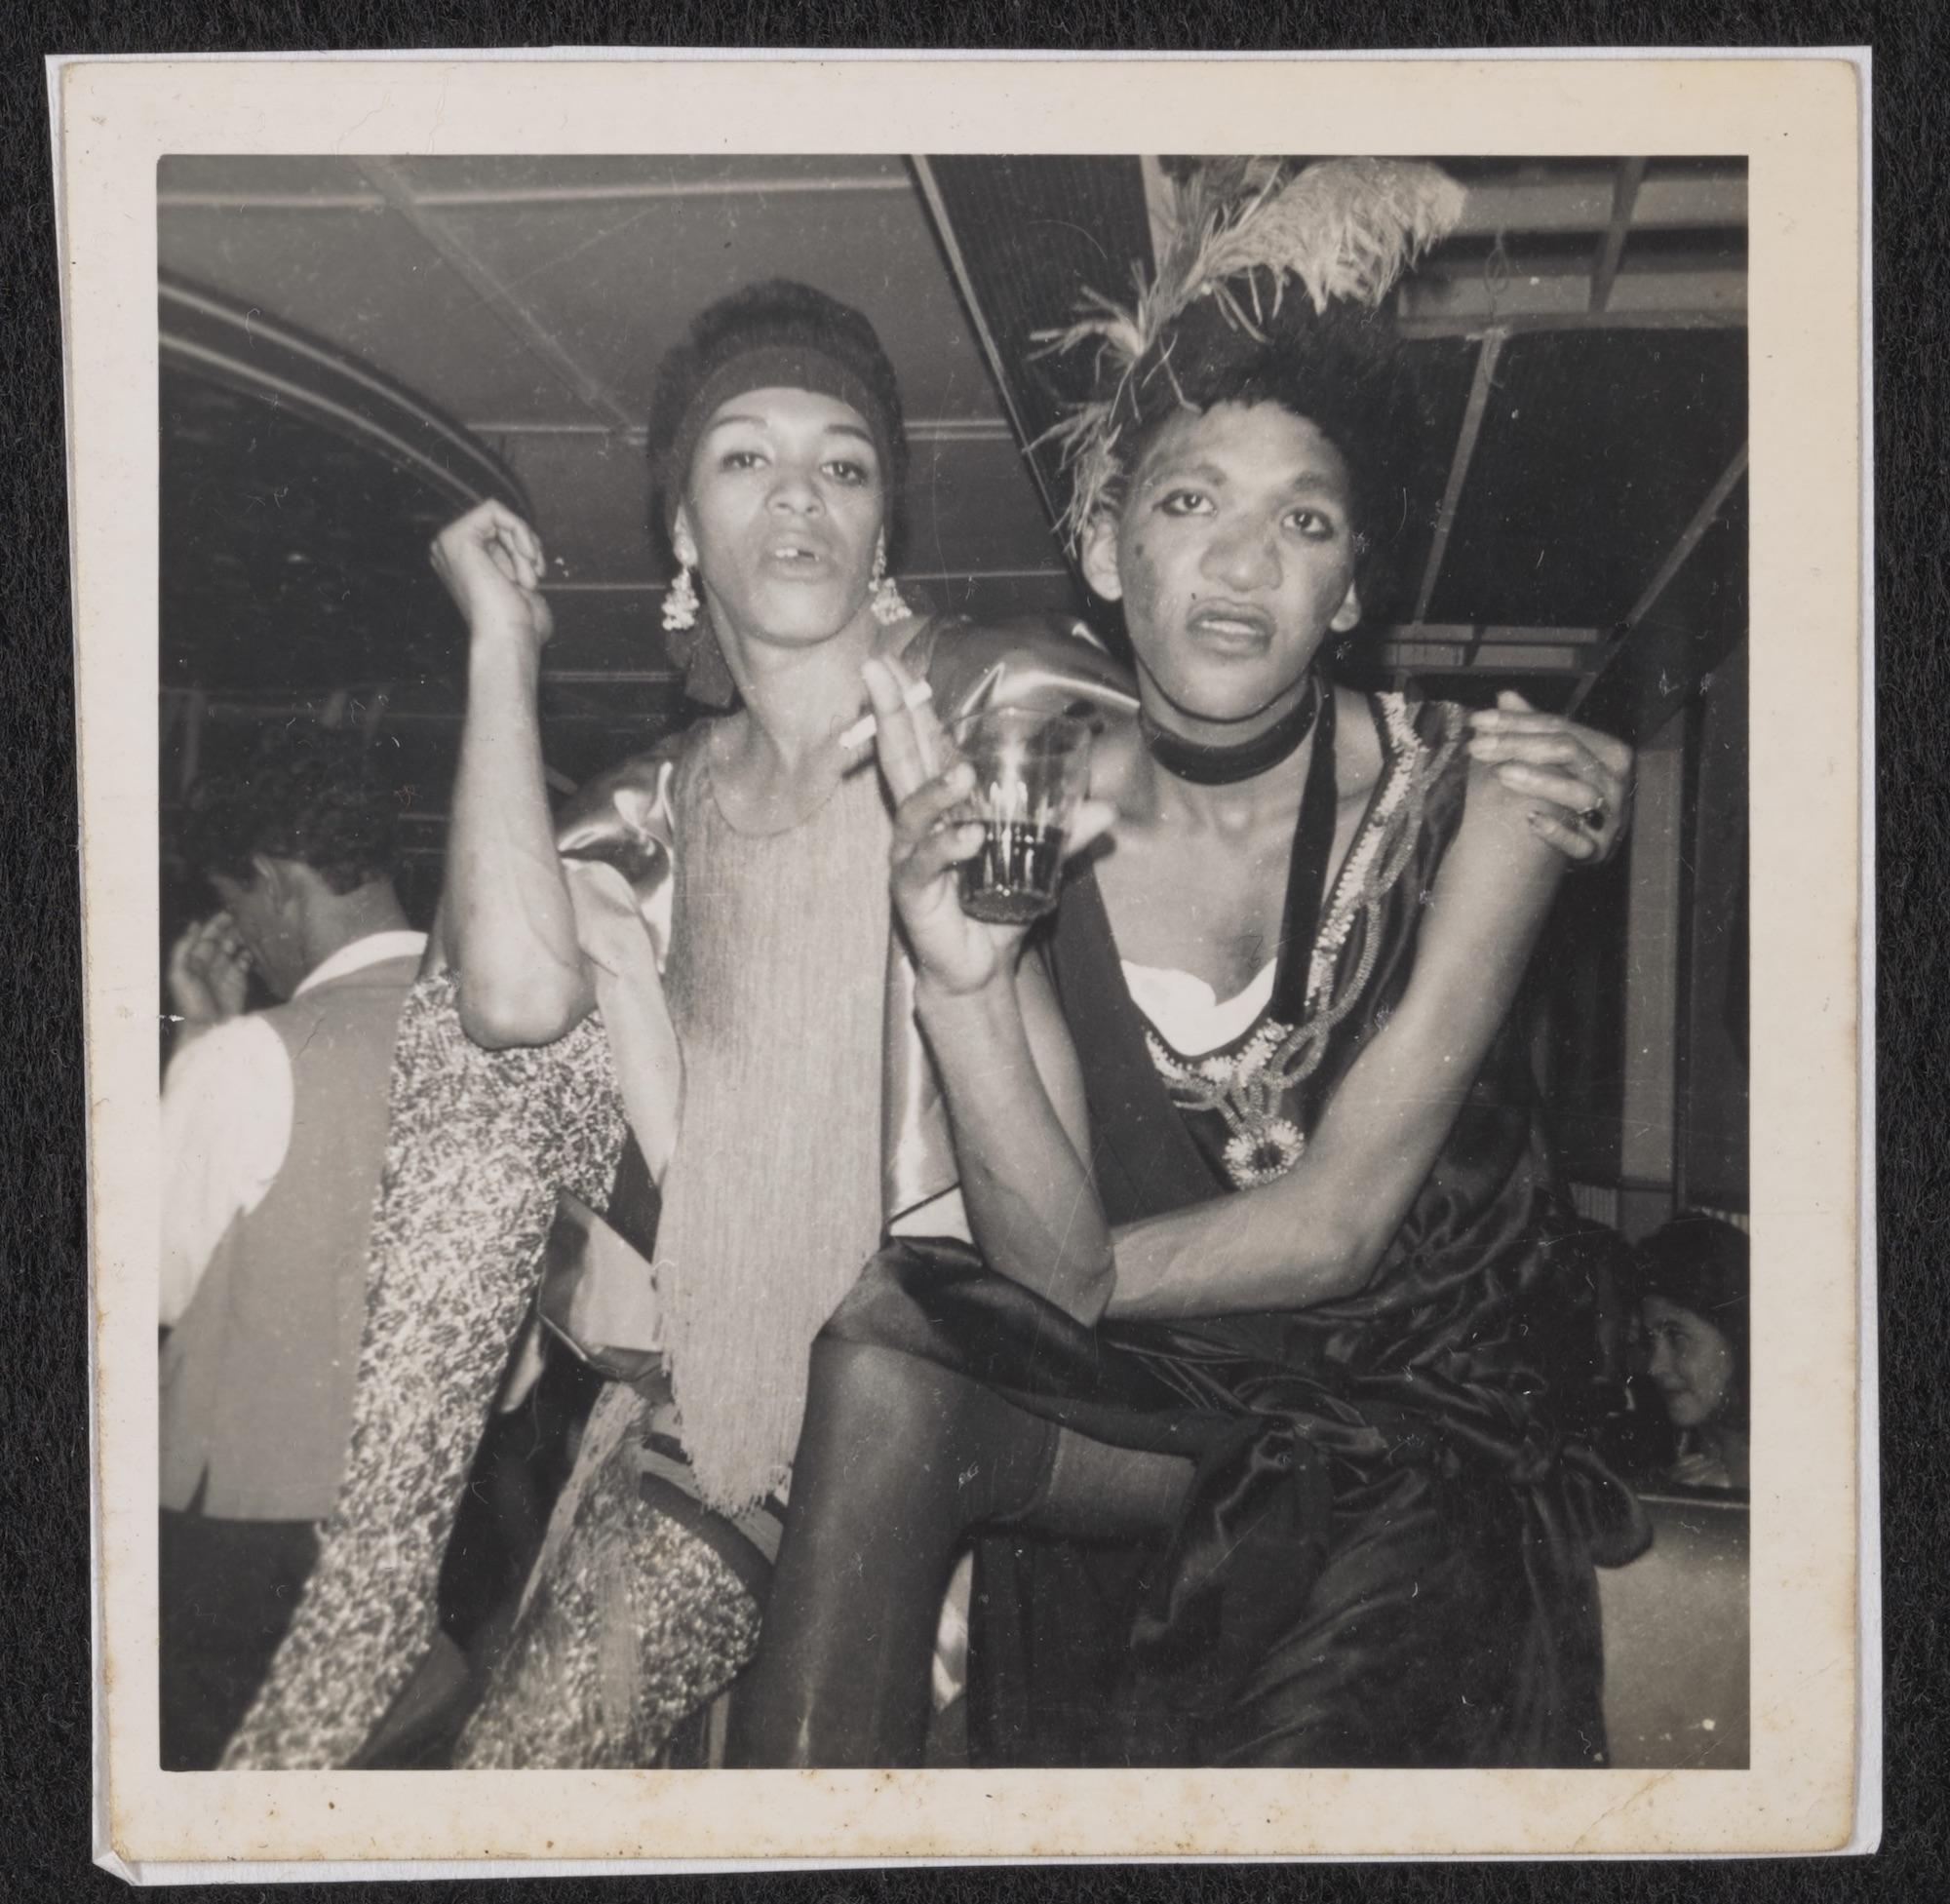 Mitzy and Bassey at the Roaring '20s Night at the Ambassador Club, circa 1950 to 1985